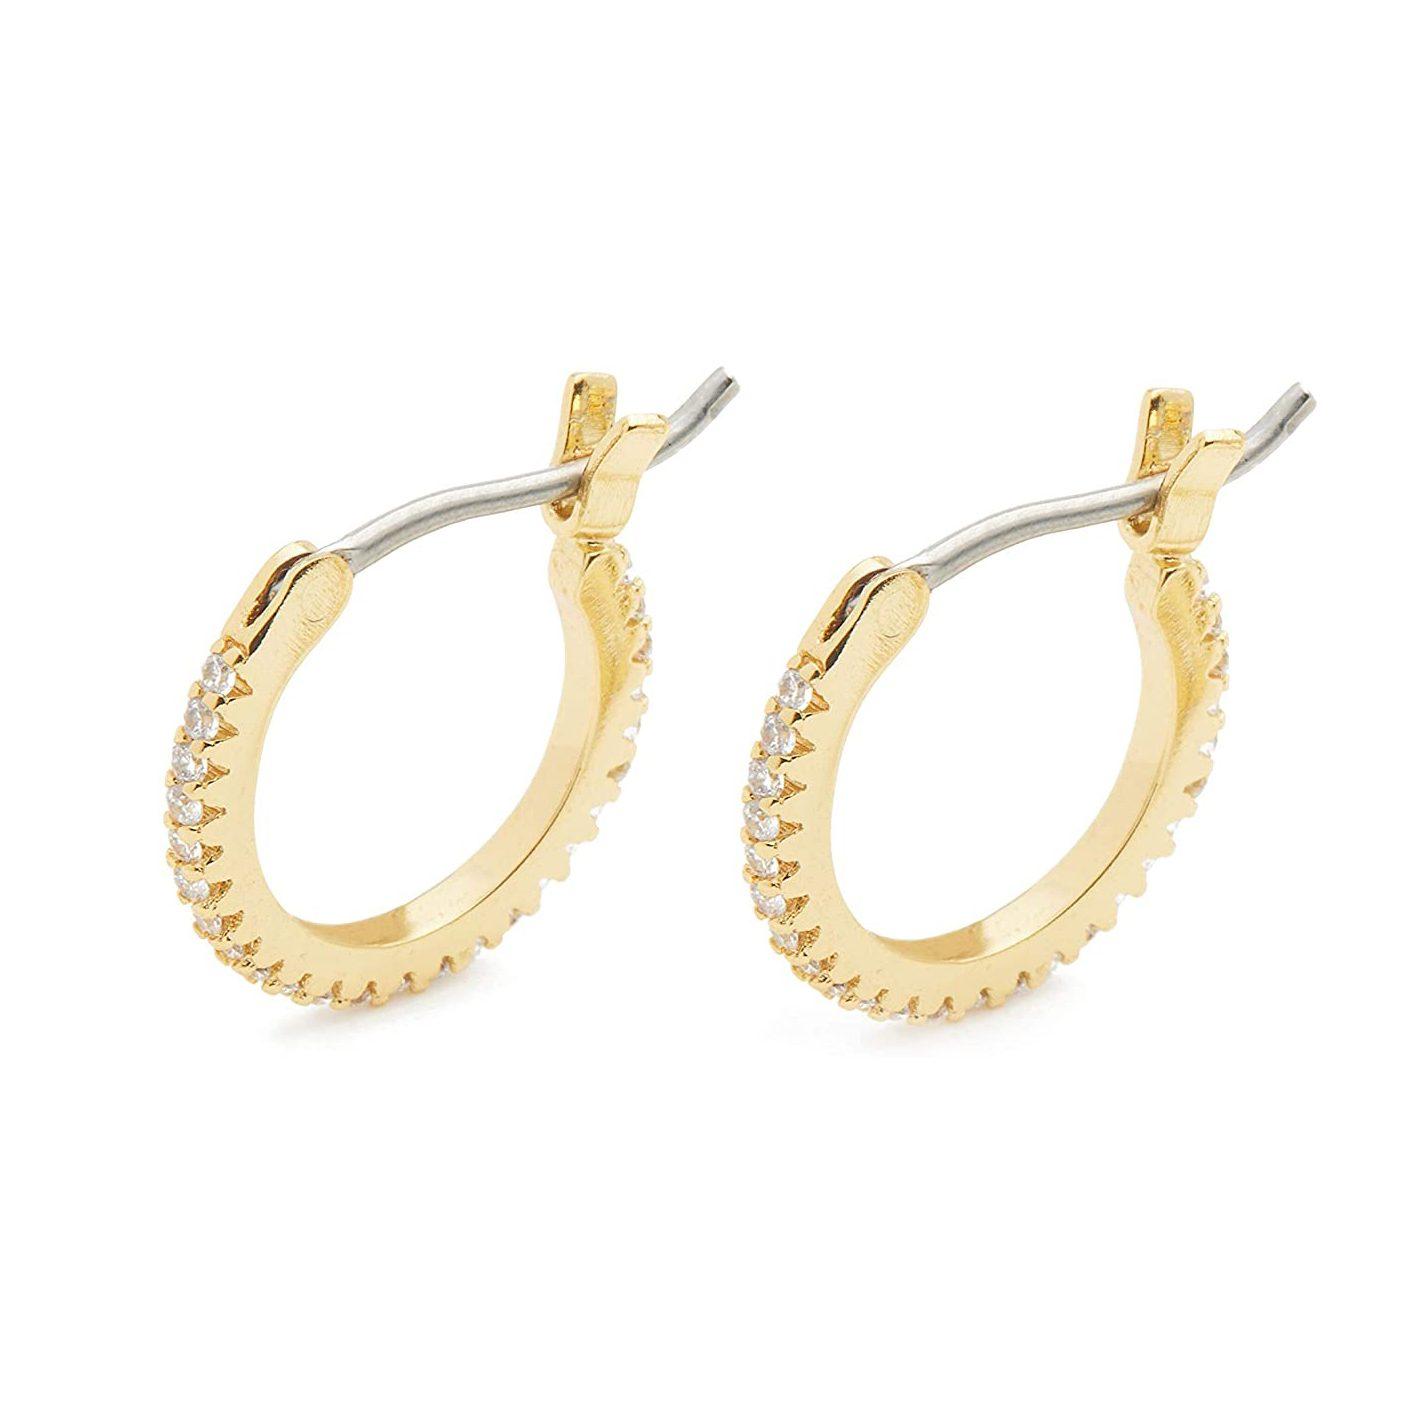 Gorjana Madison Huggies earrings gold hoops